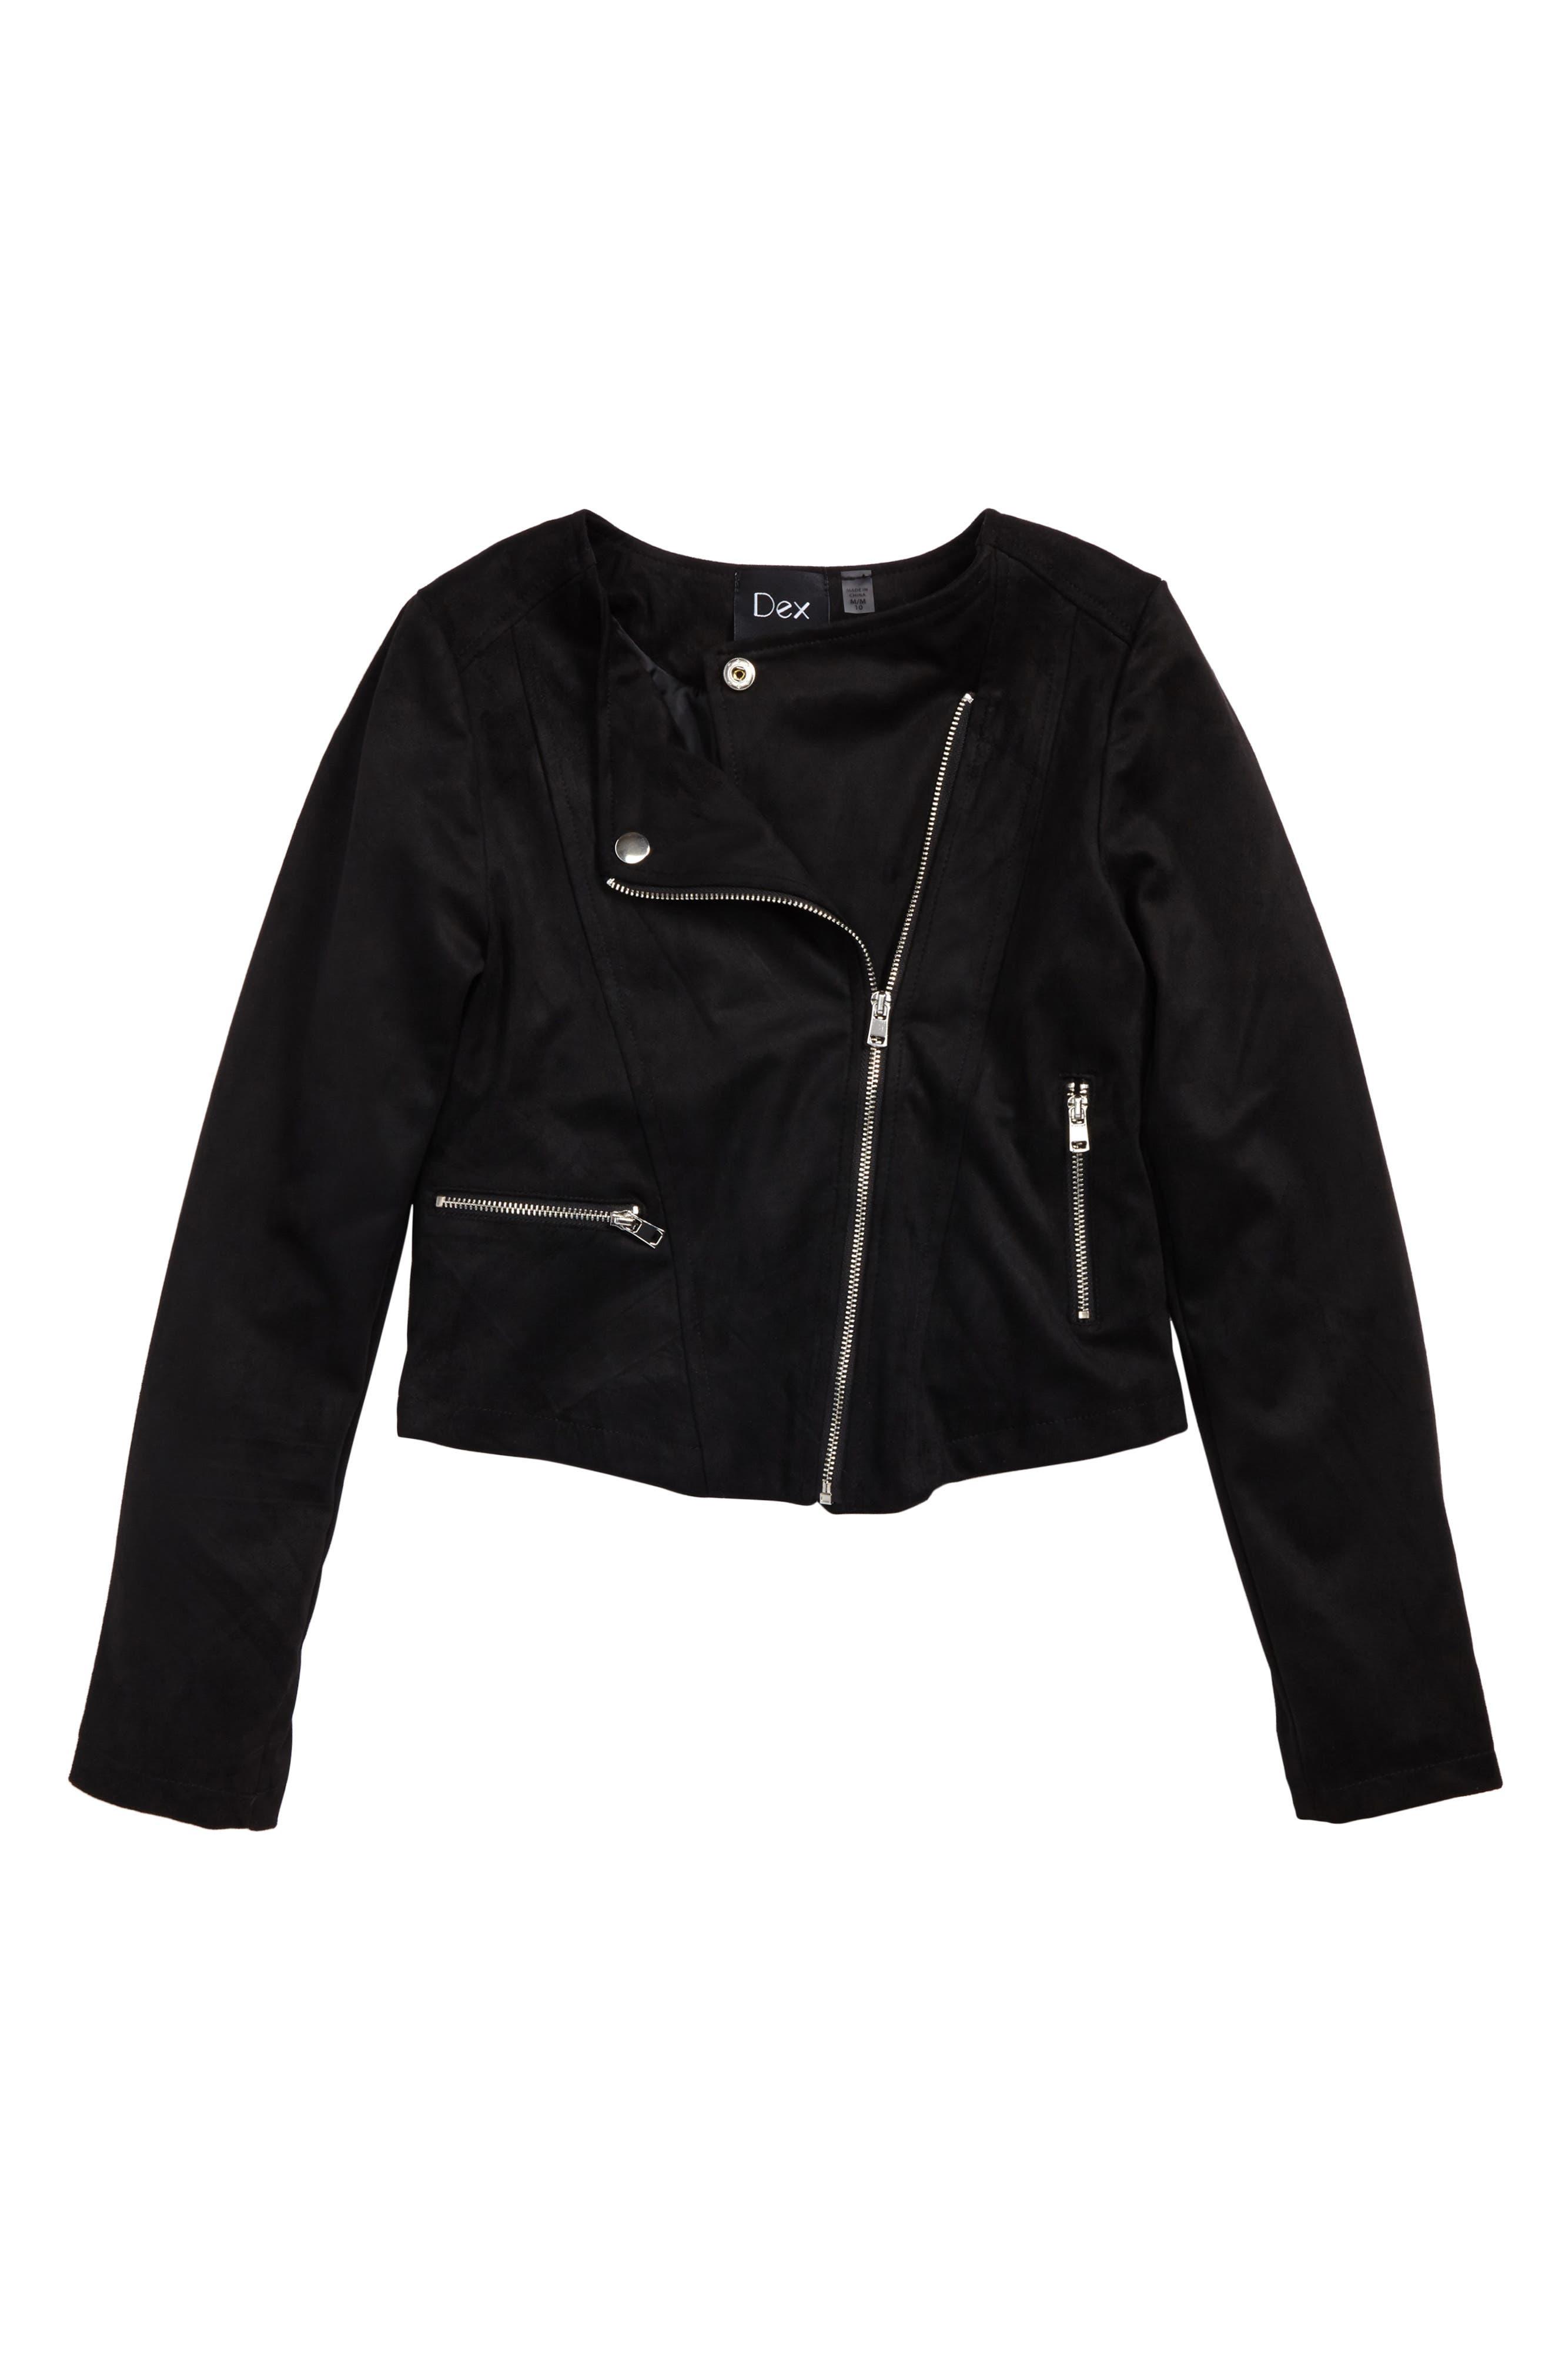 Alternate Image 1 Selected - DEX Moto Faux Suede Jacket (Big Girls)